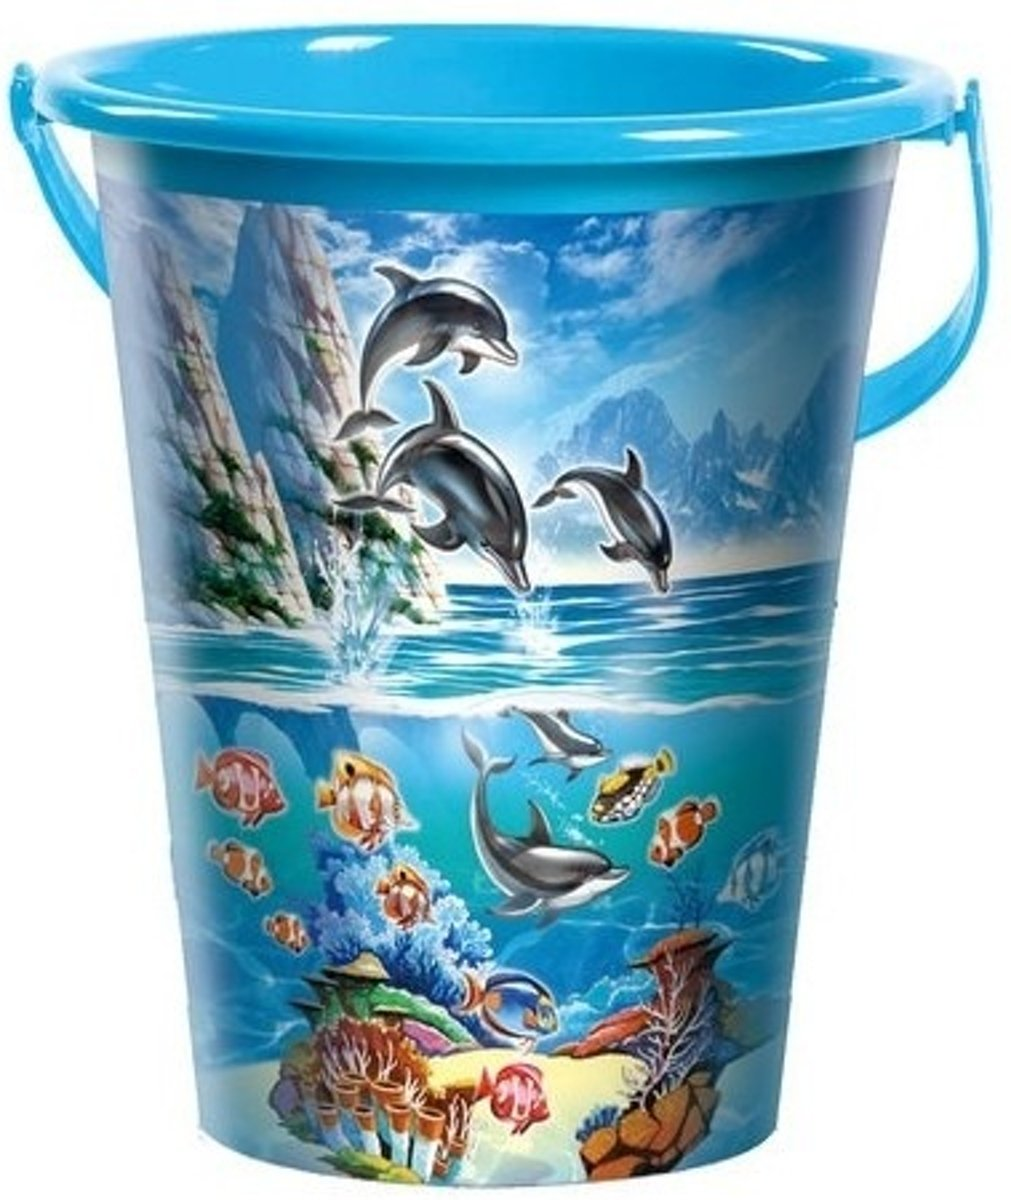 Grote blauwe speelgoed strandemmer oceaandieren